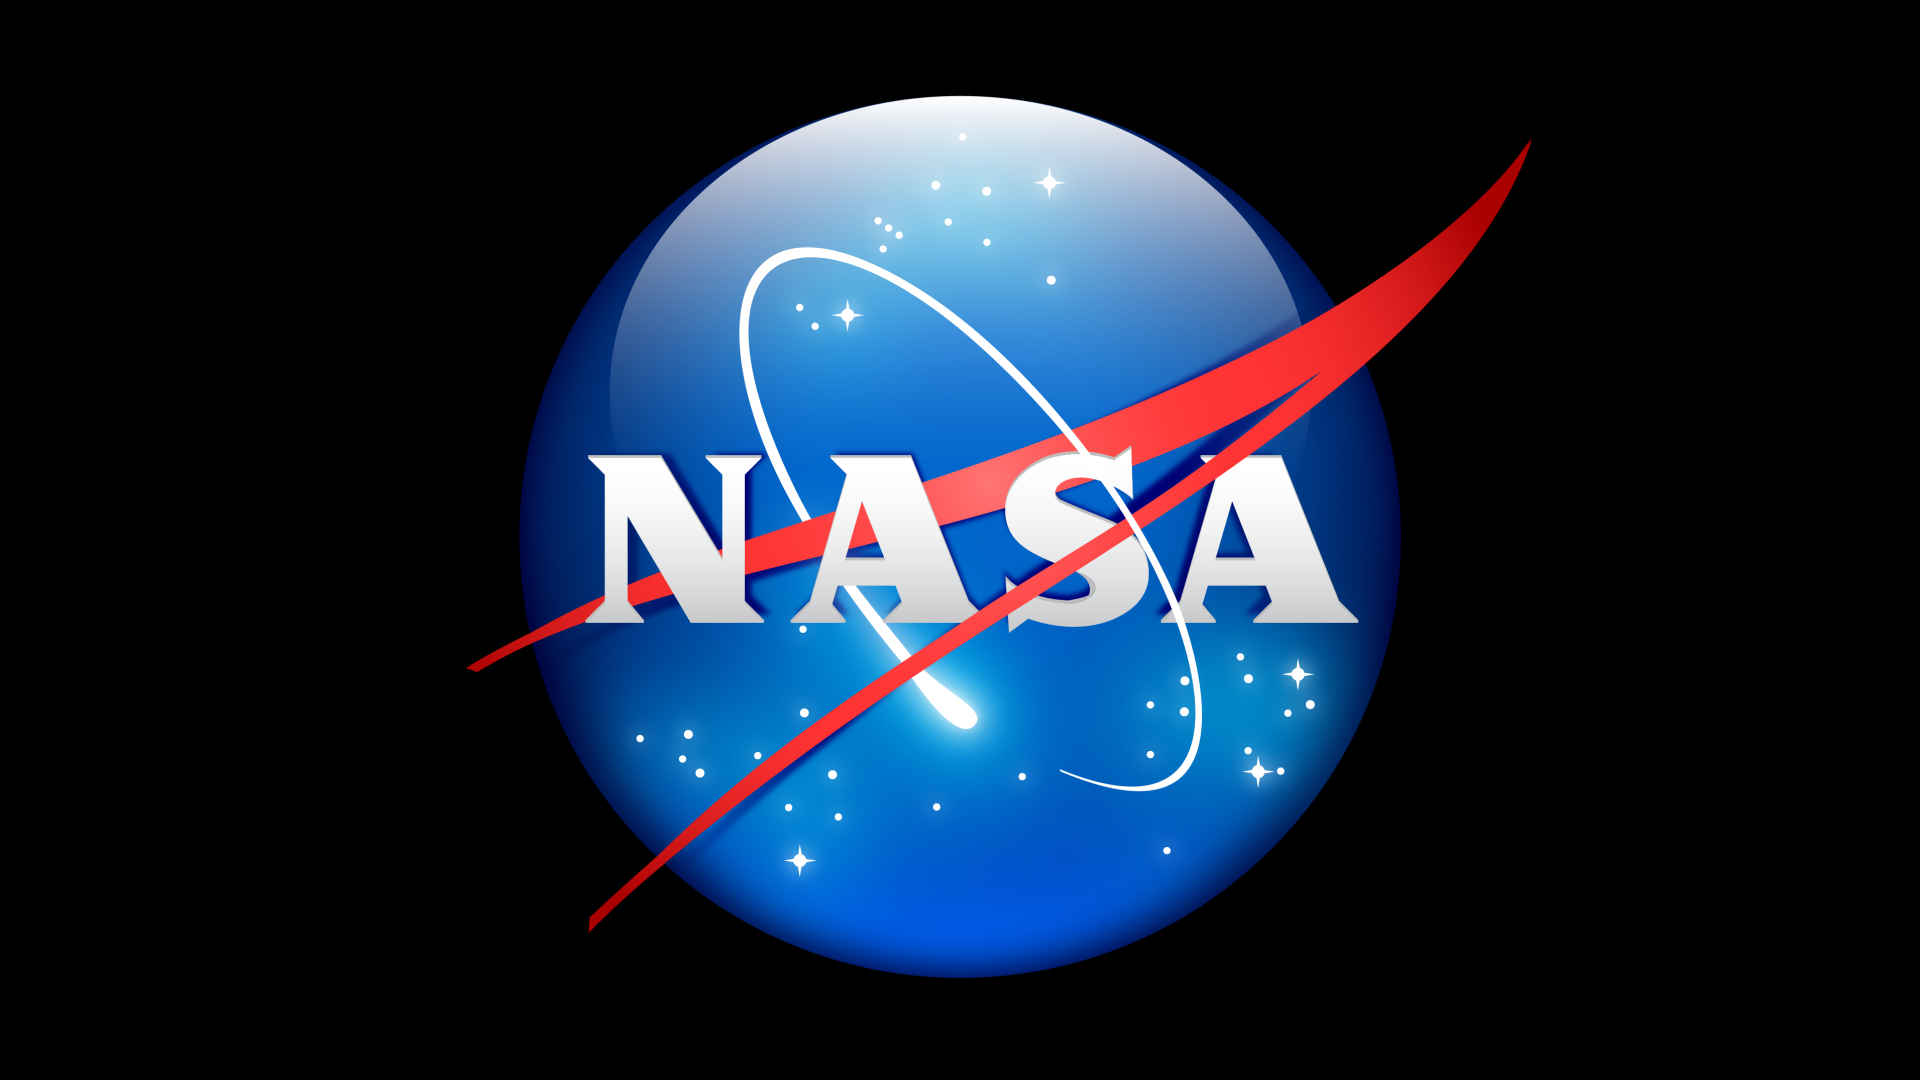 Nasa Logo Hd Wallpapers Download Free Nasa Logo Tumblr Pinterest